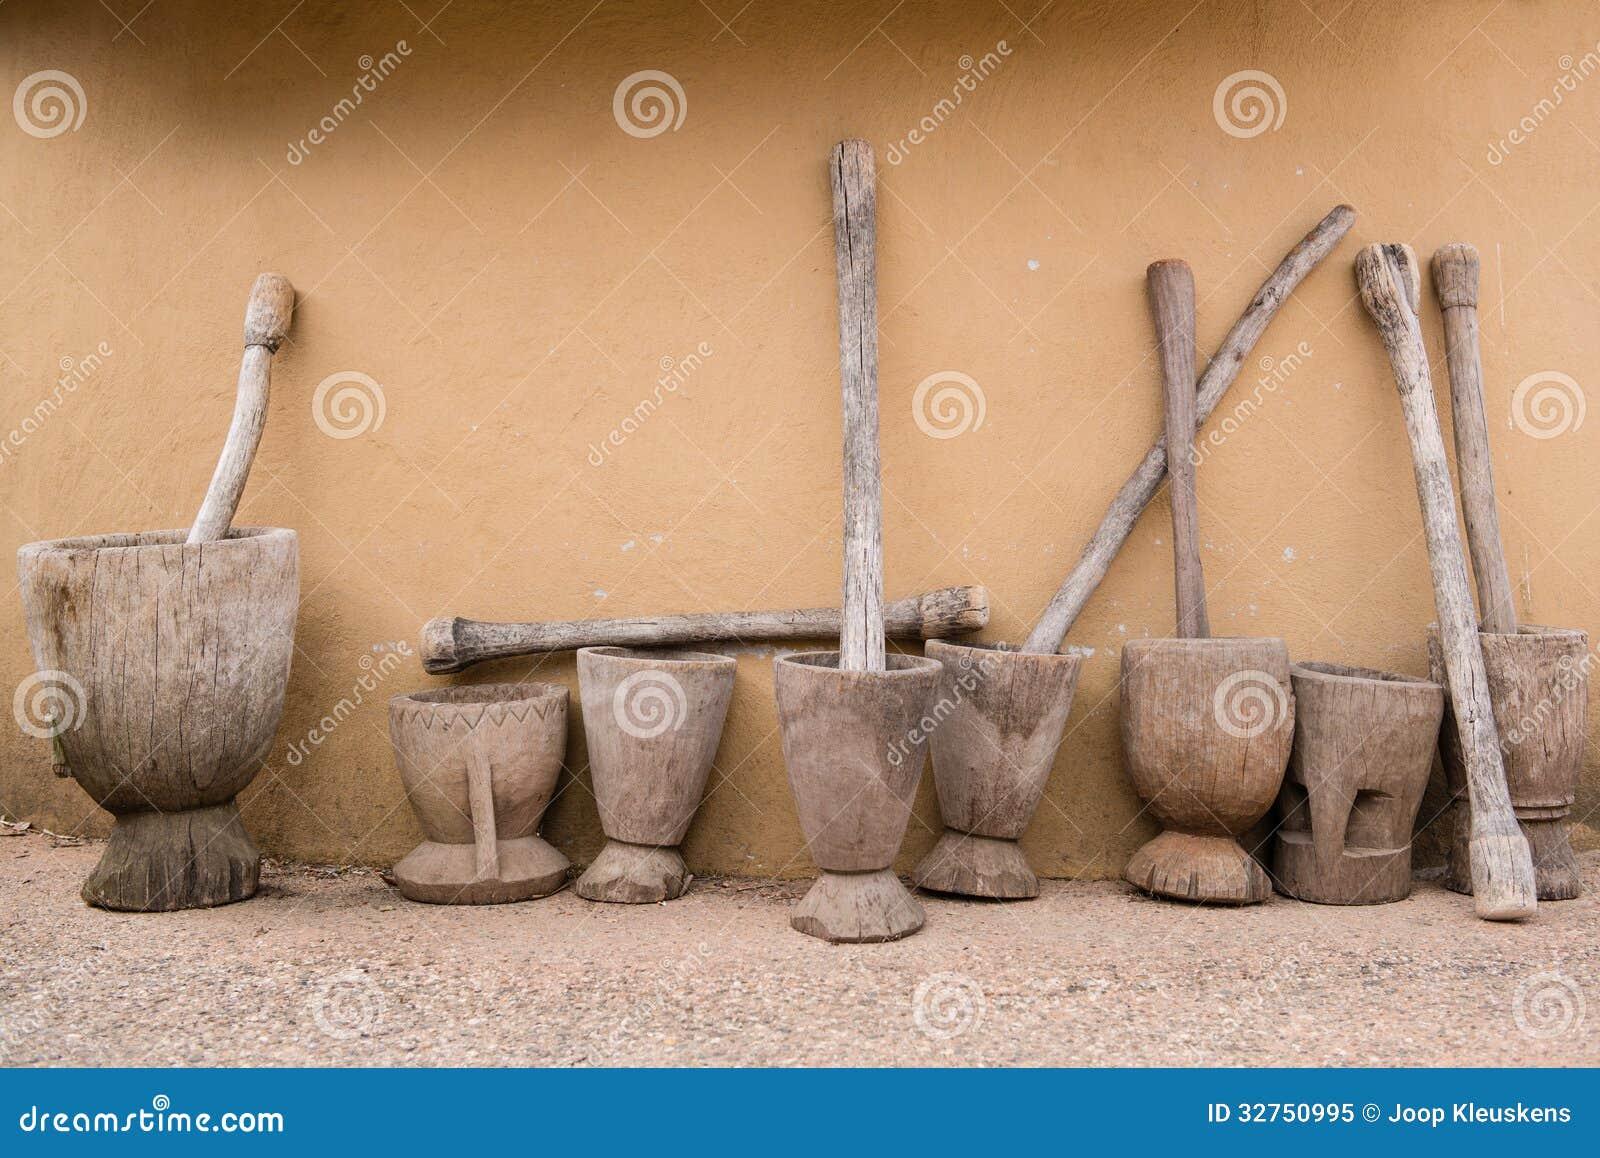 mortier et pilon en bois image stock image du broyeur. Black Bedroom Furniture Sets. Home Design Ideas